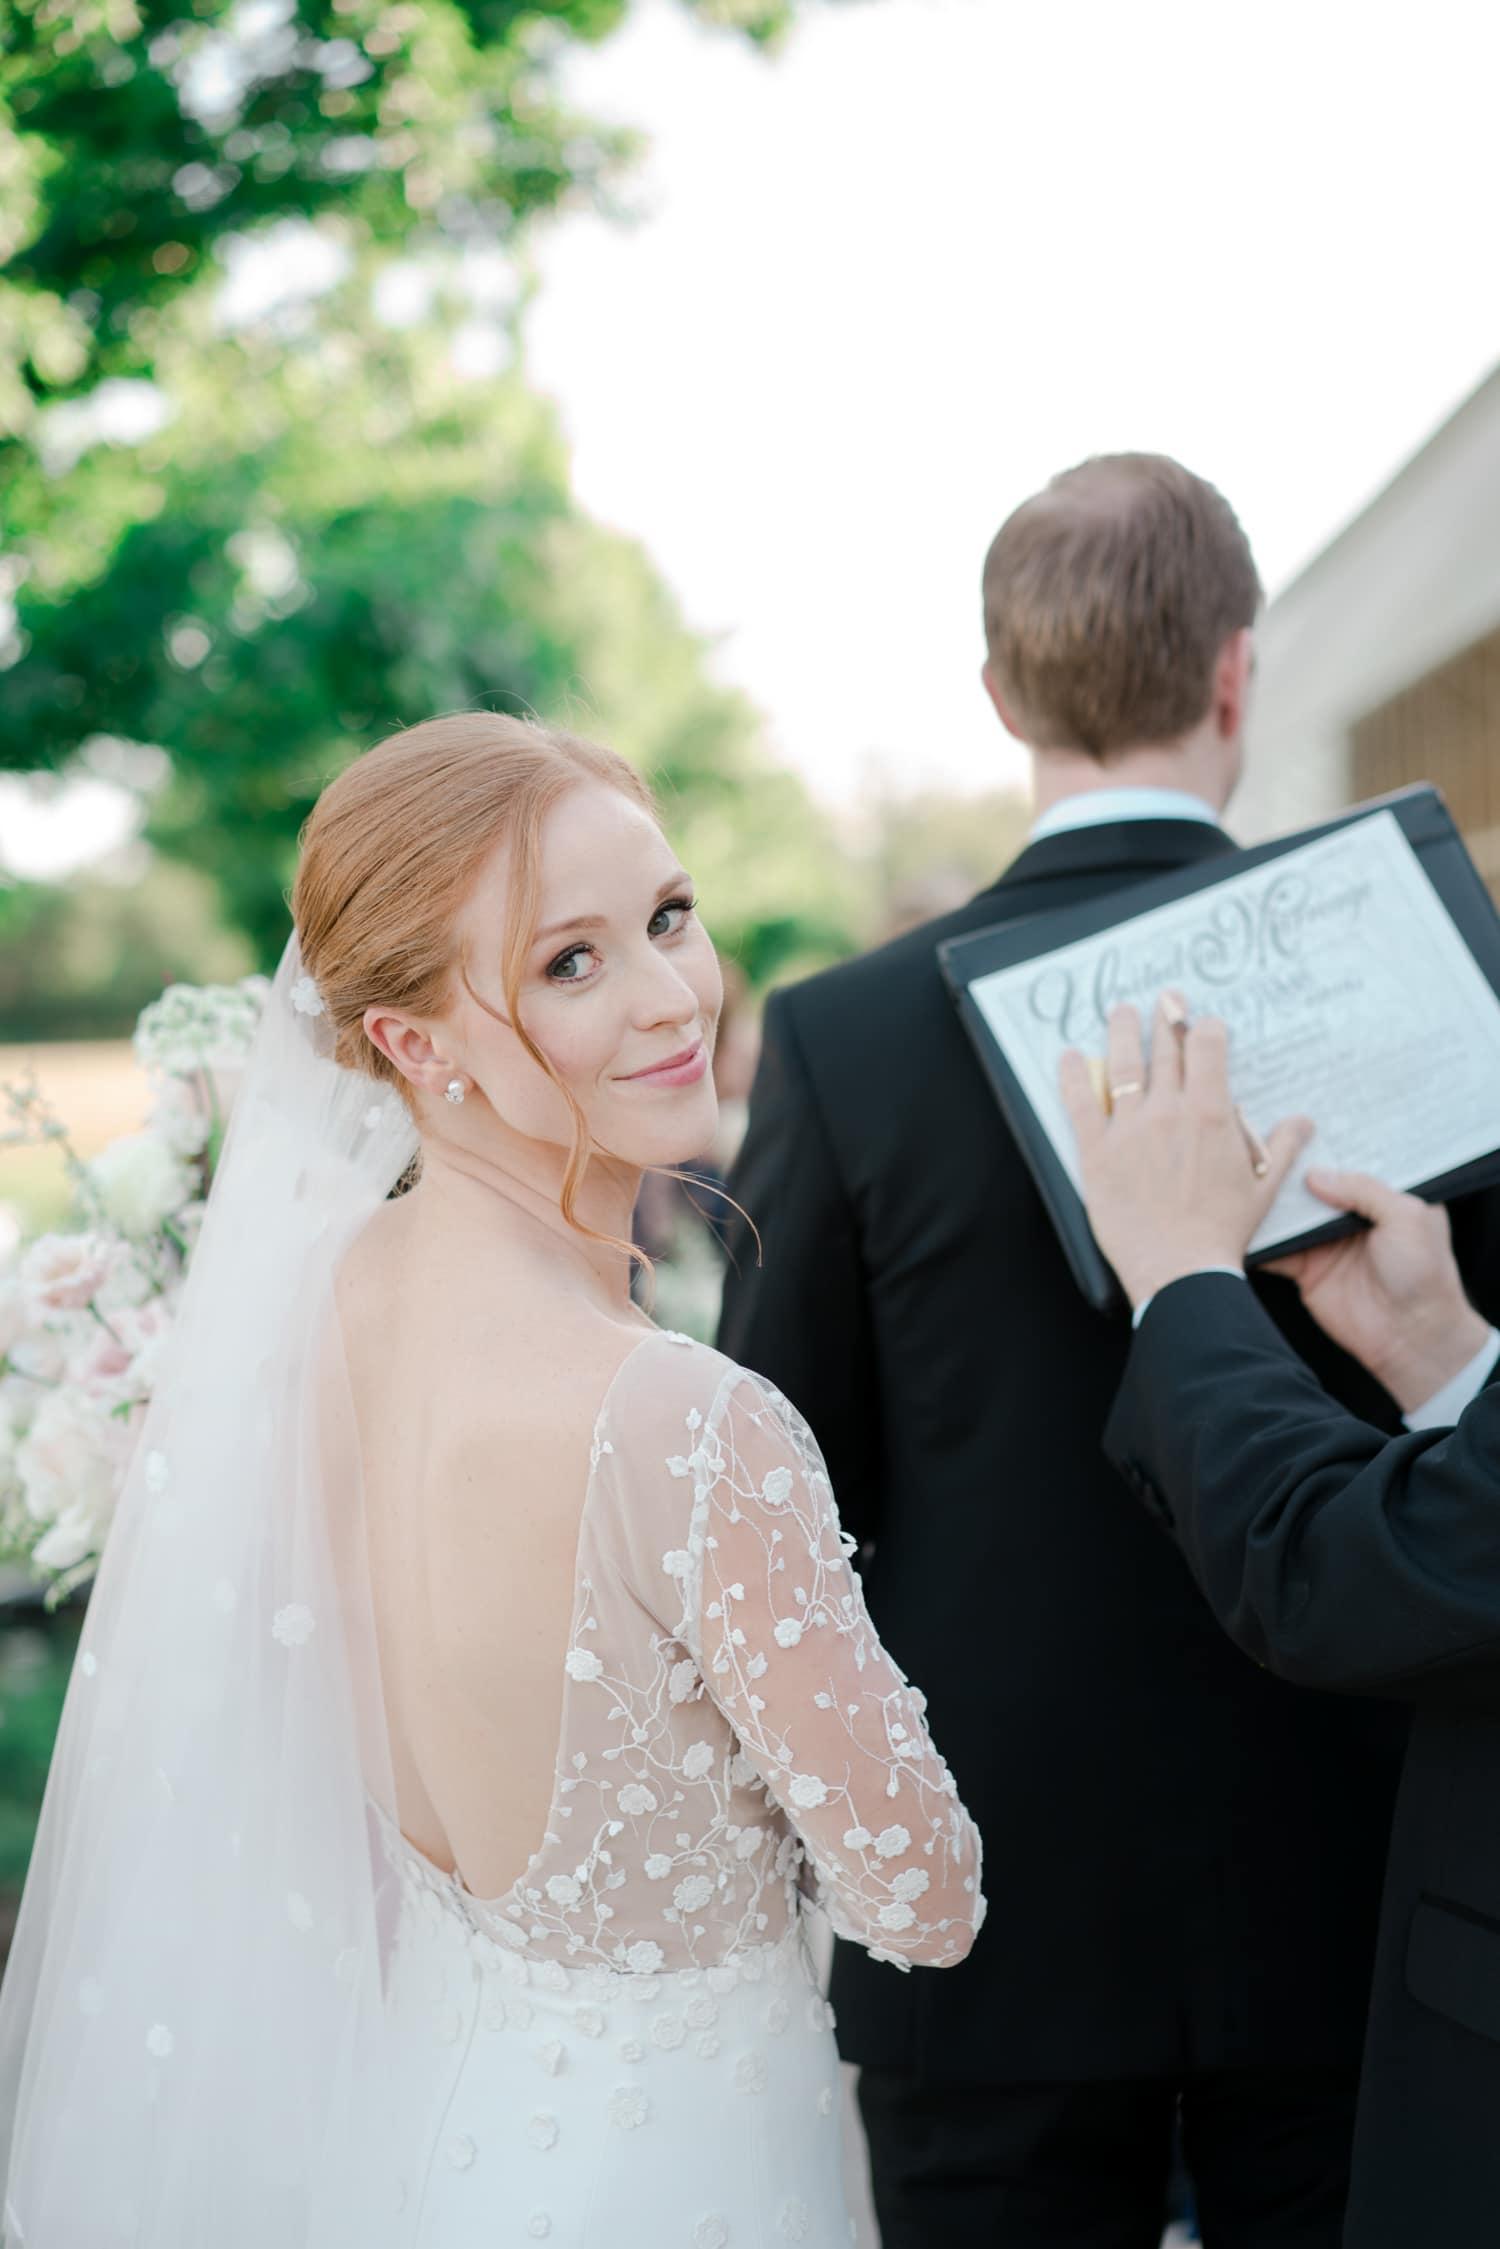 prospect-house-wedding-32.jpg